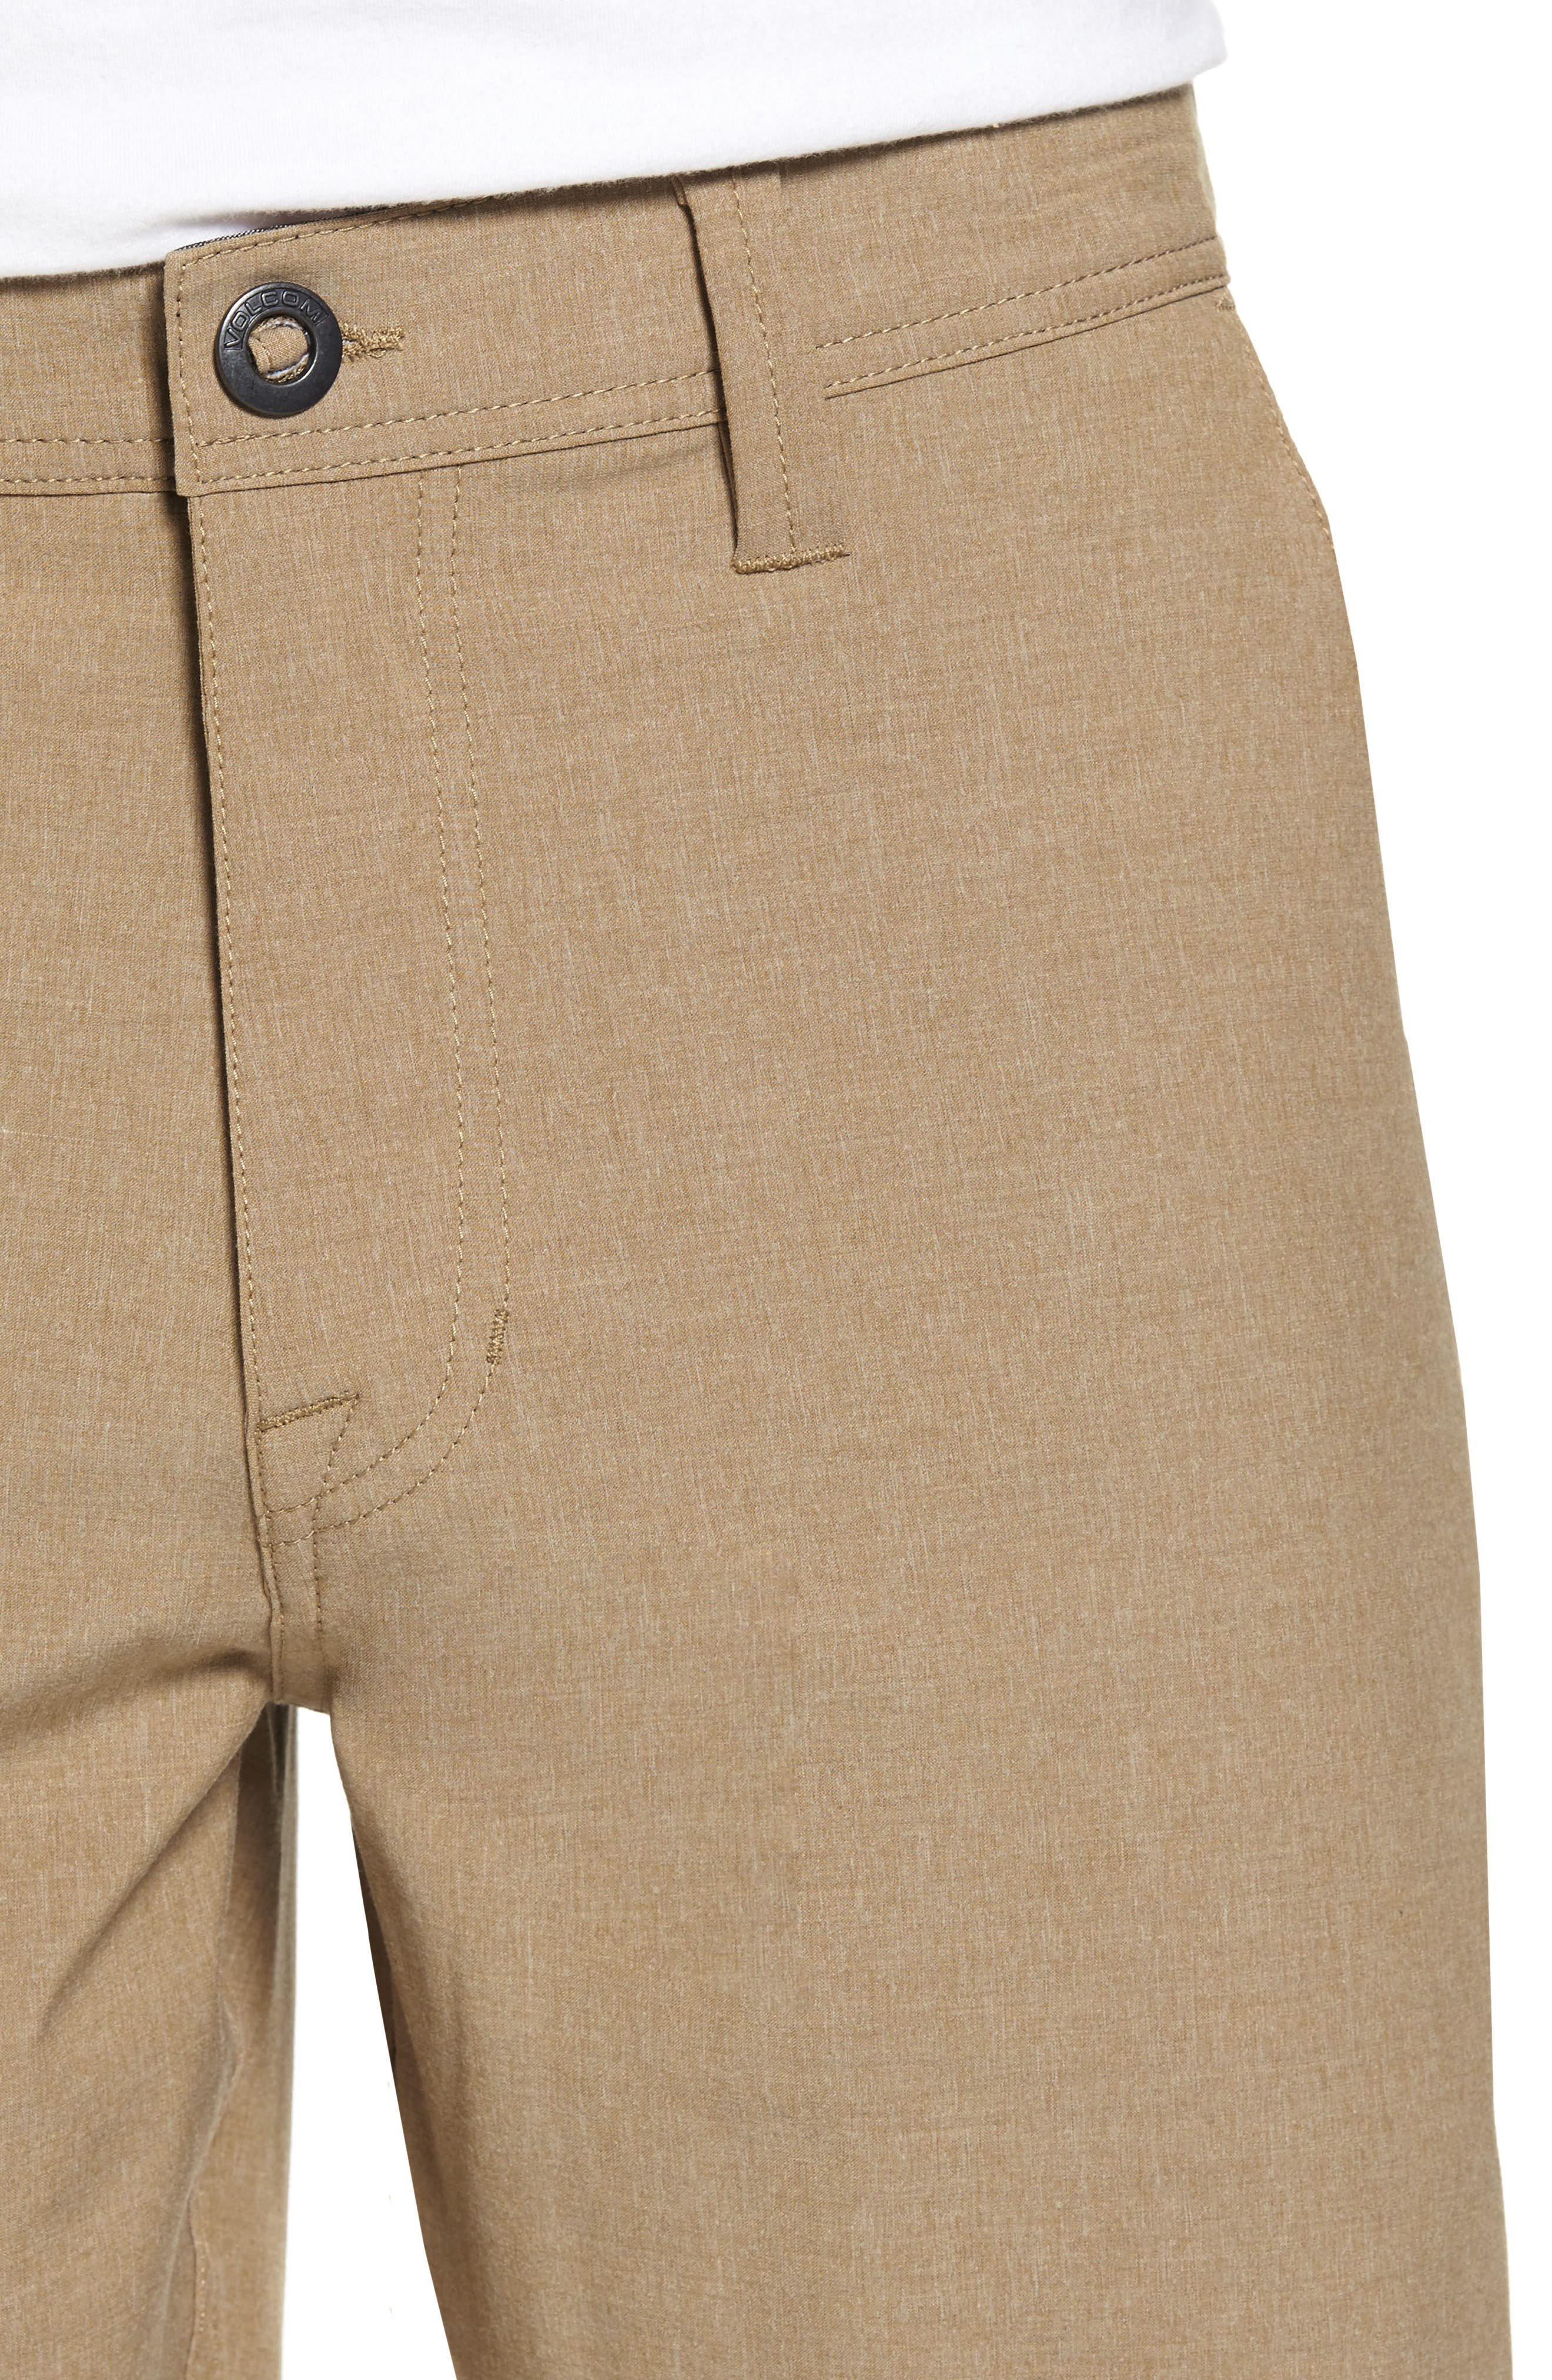 Hybrid Shorts,                             Alternate thumbnail 4, color,                             BEIGE